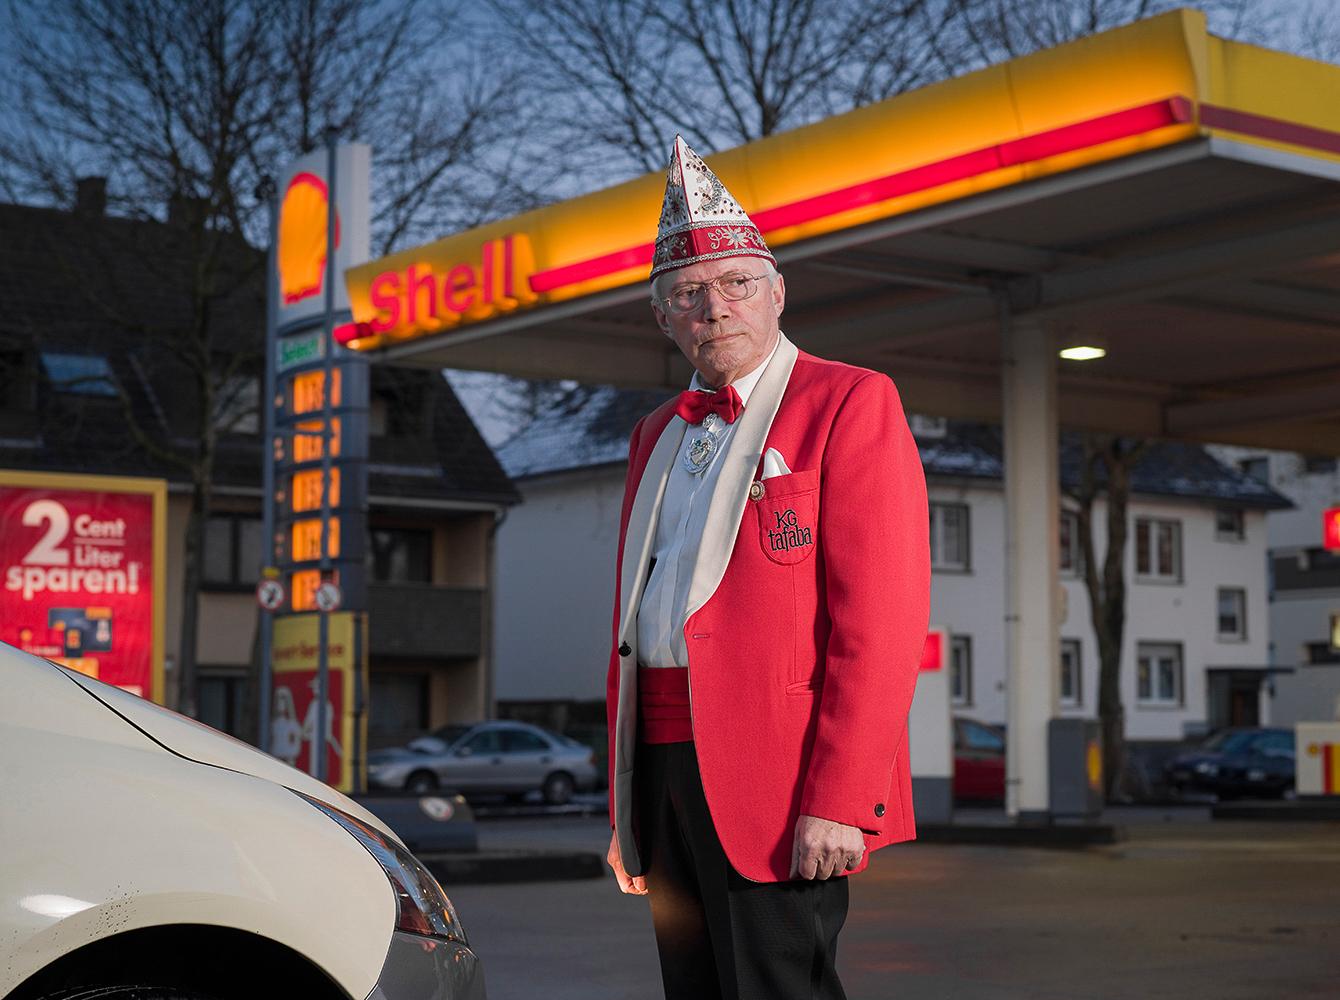 Taxifahrer Ball, Horst Kappey